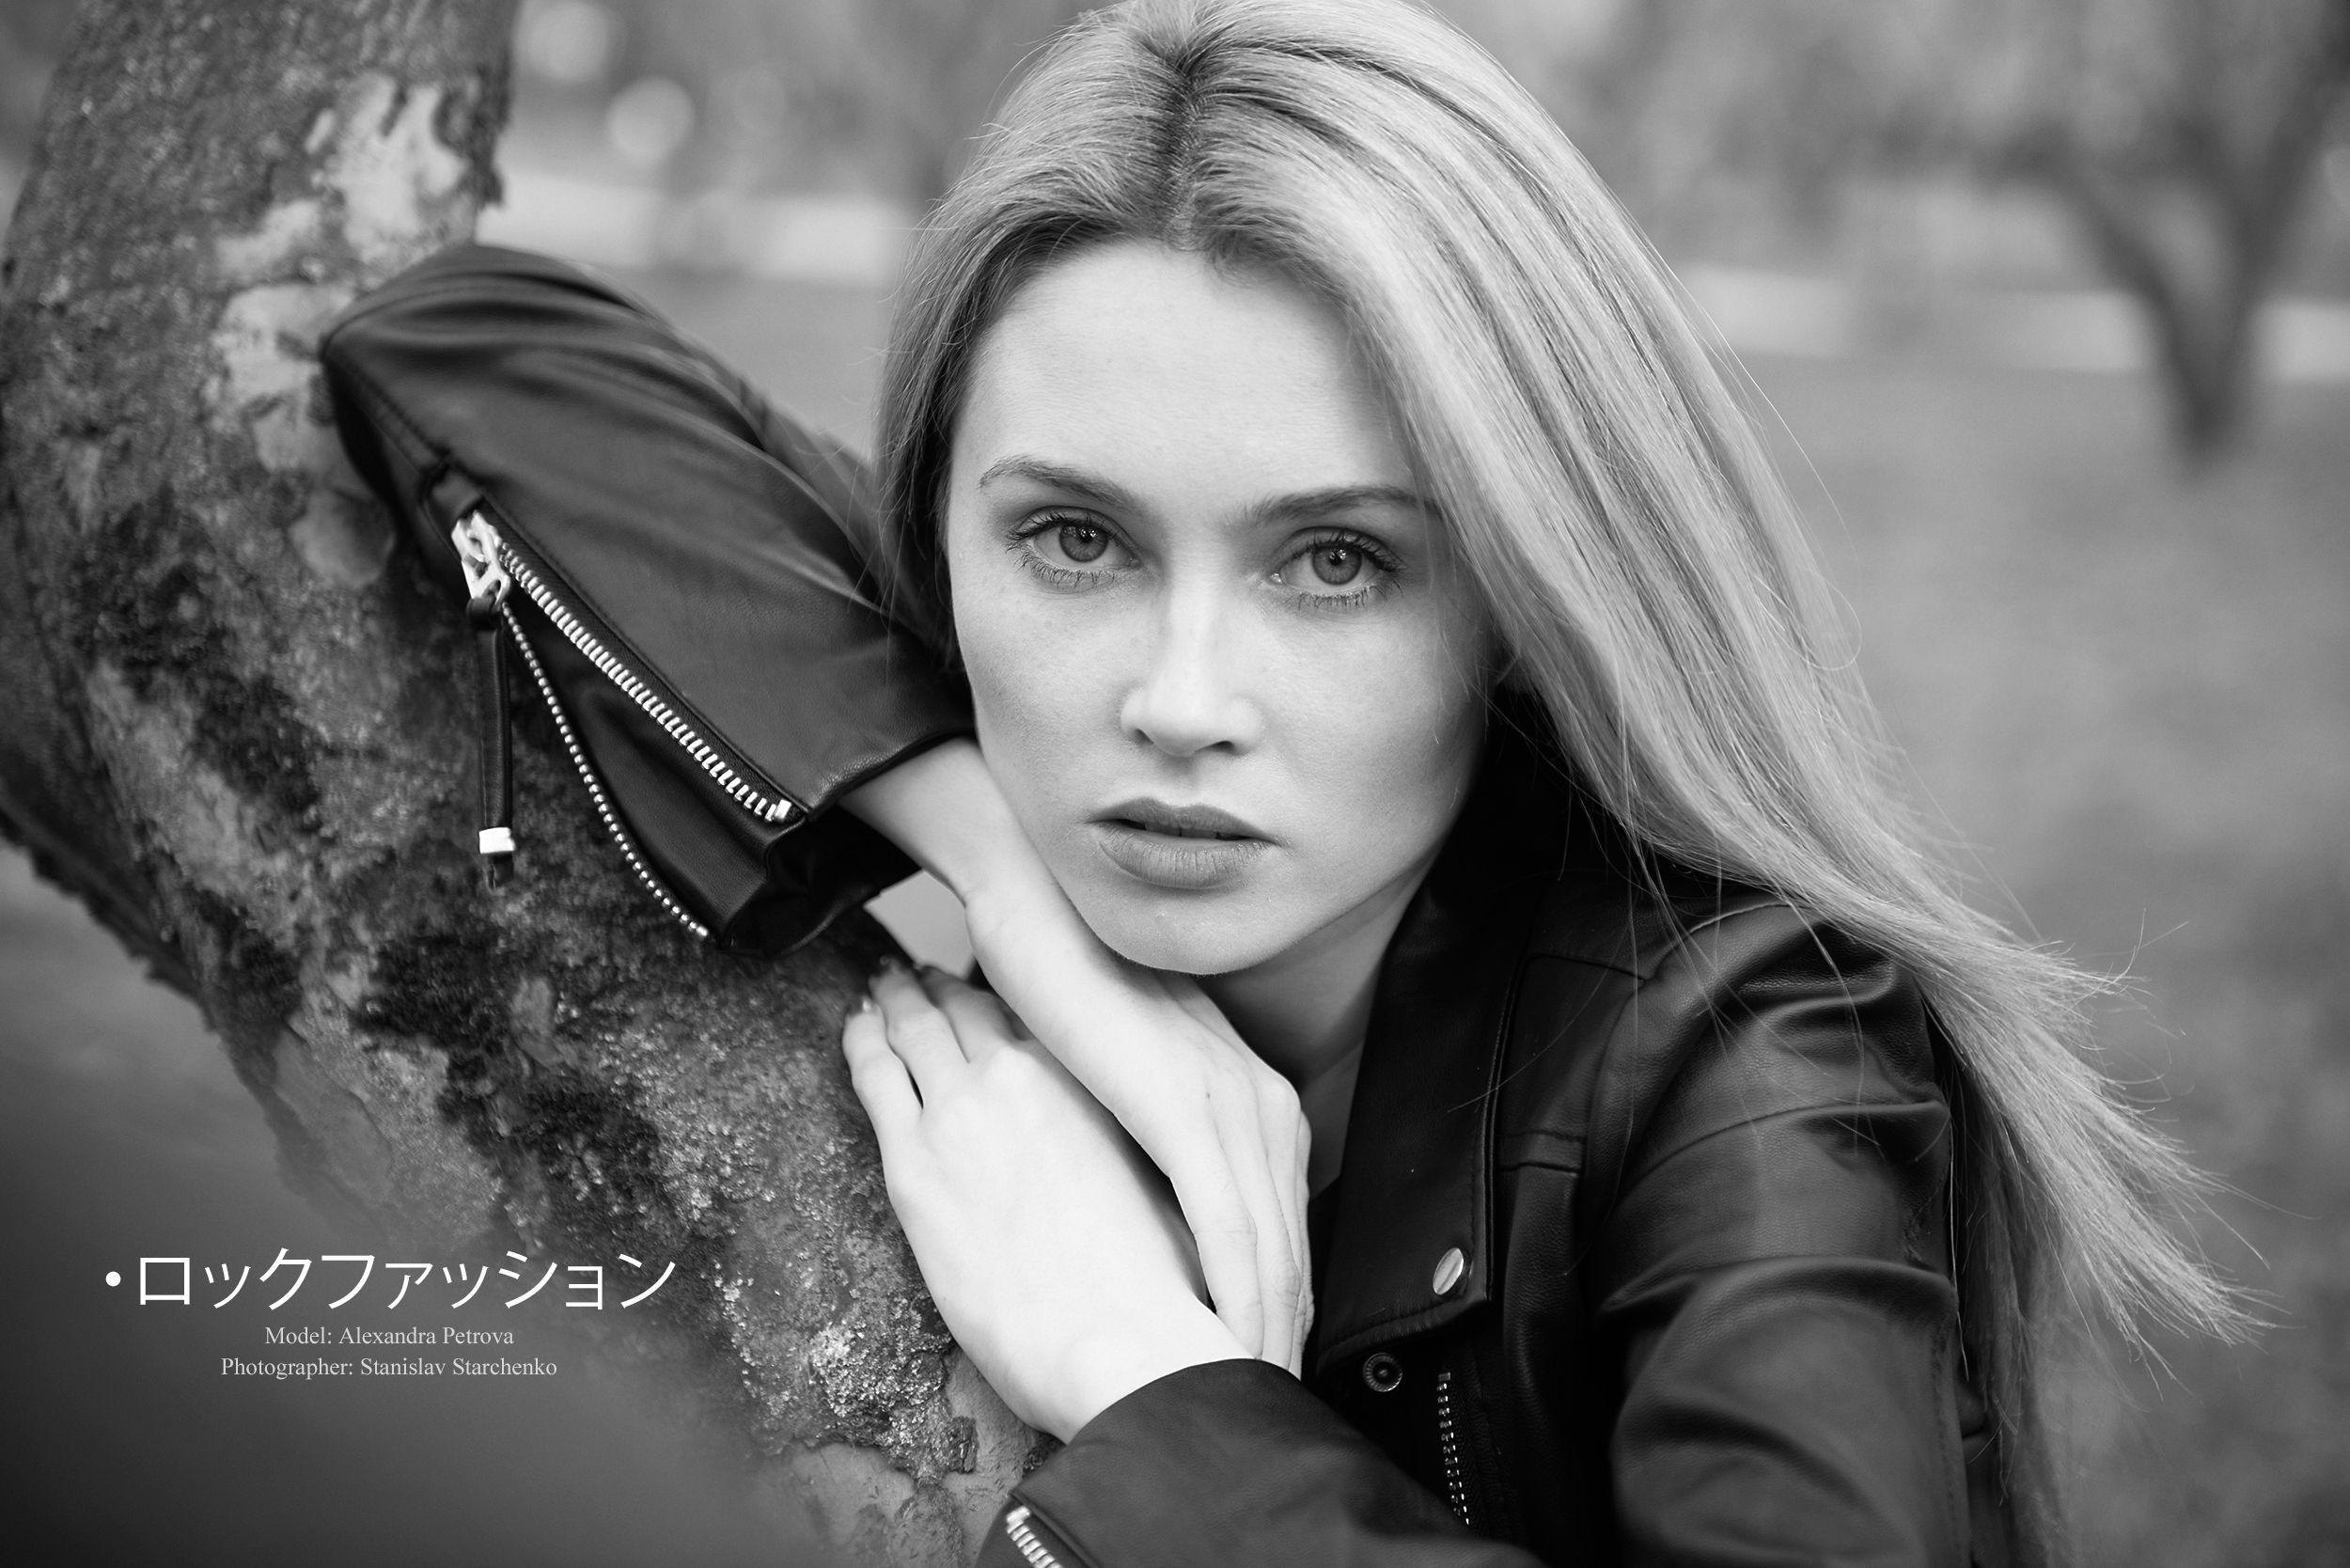 #fashion #rock #russia #moda #style #beauty #street #star